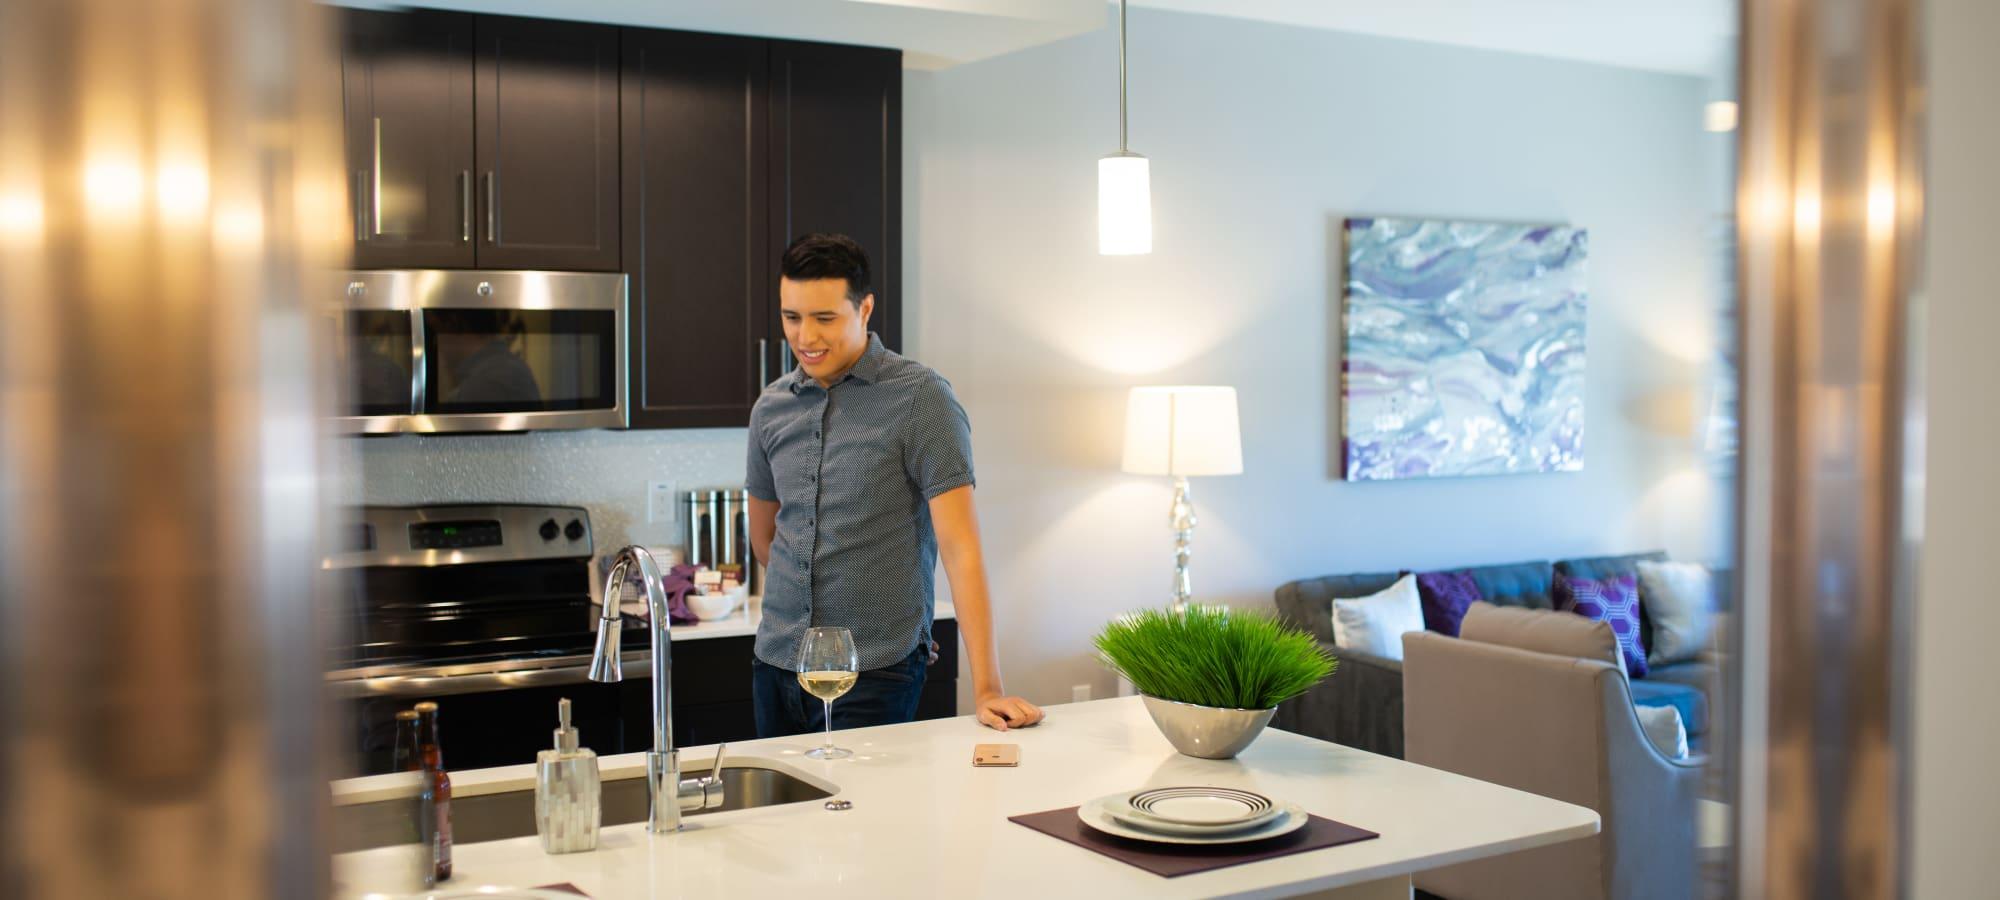 Residents enjoying their new kitchen at The Astor at Osborn in Phoenix, Arizona